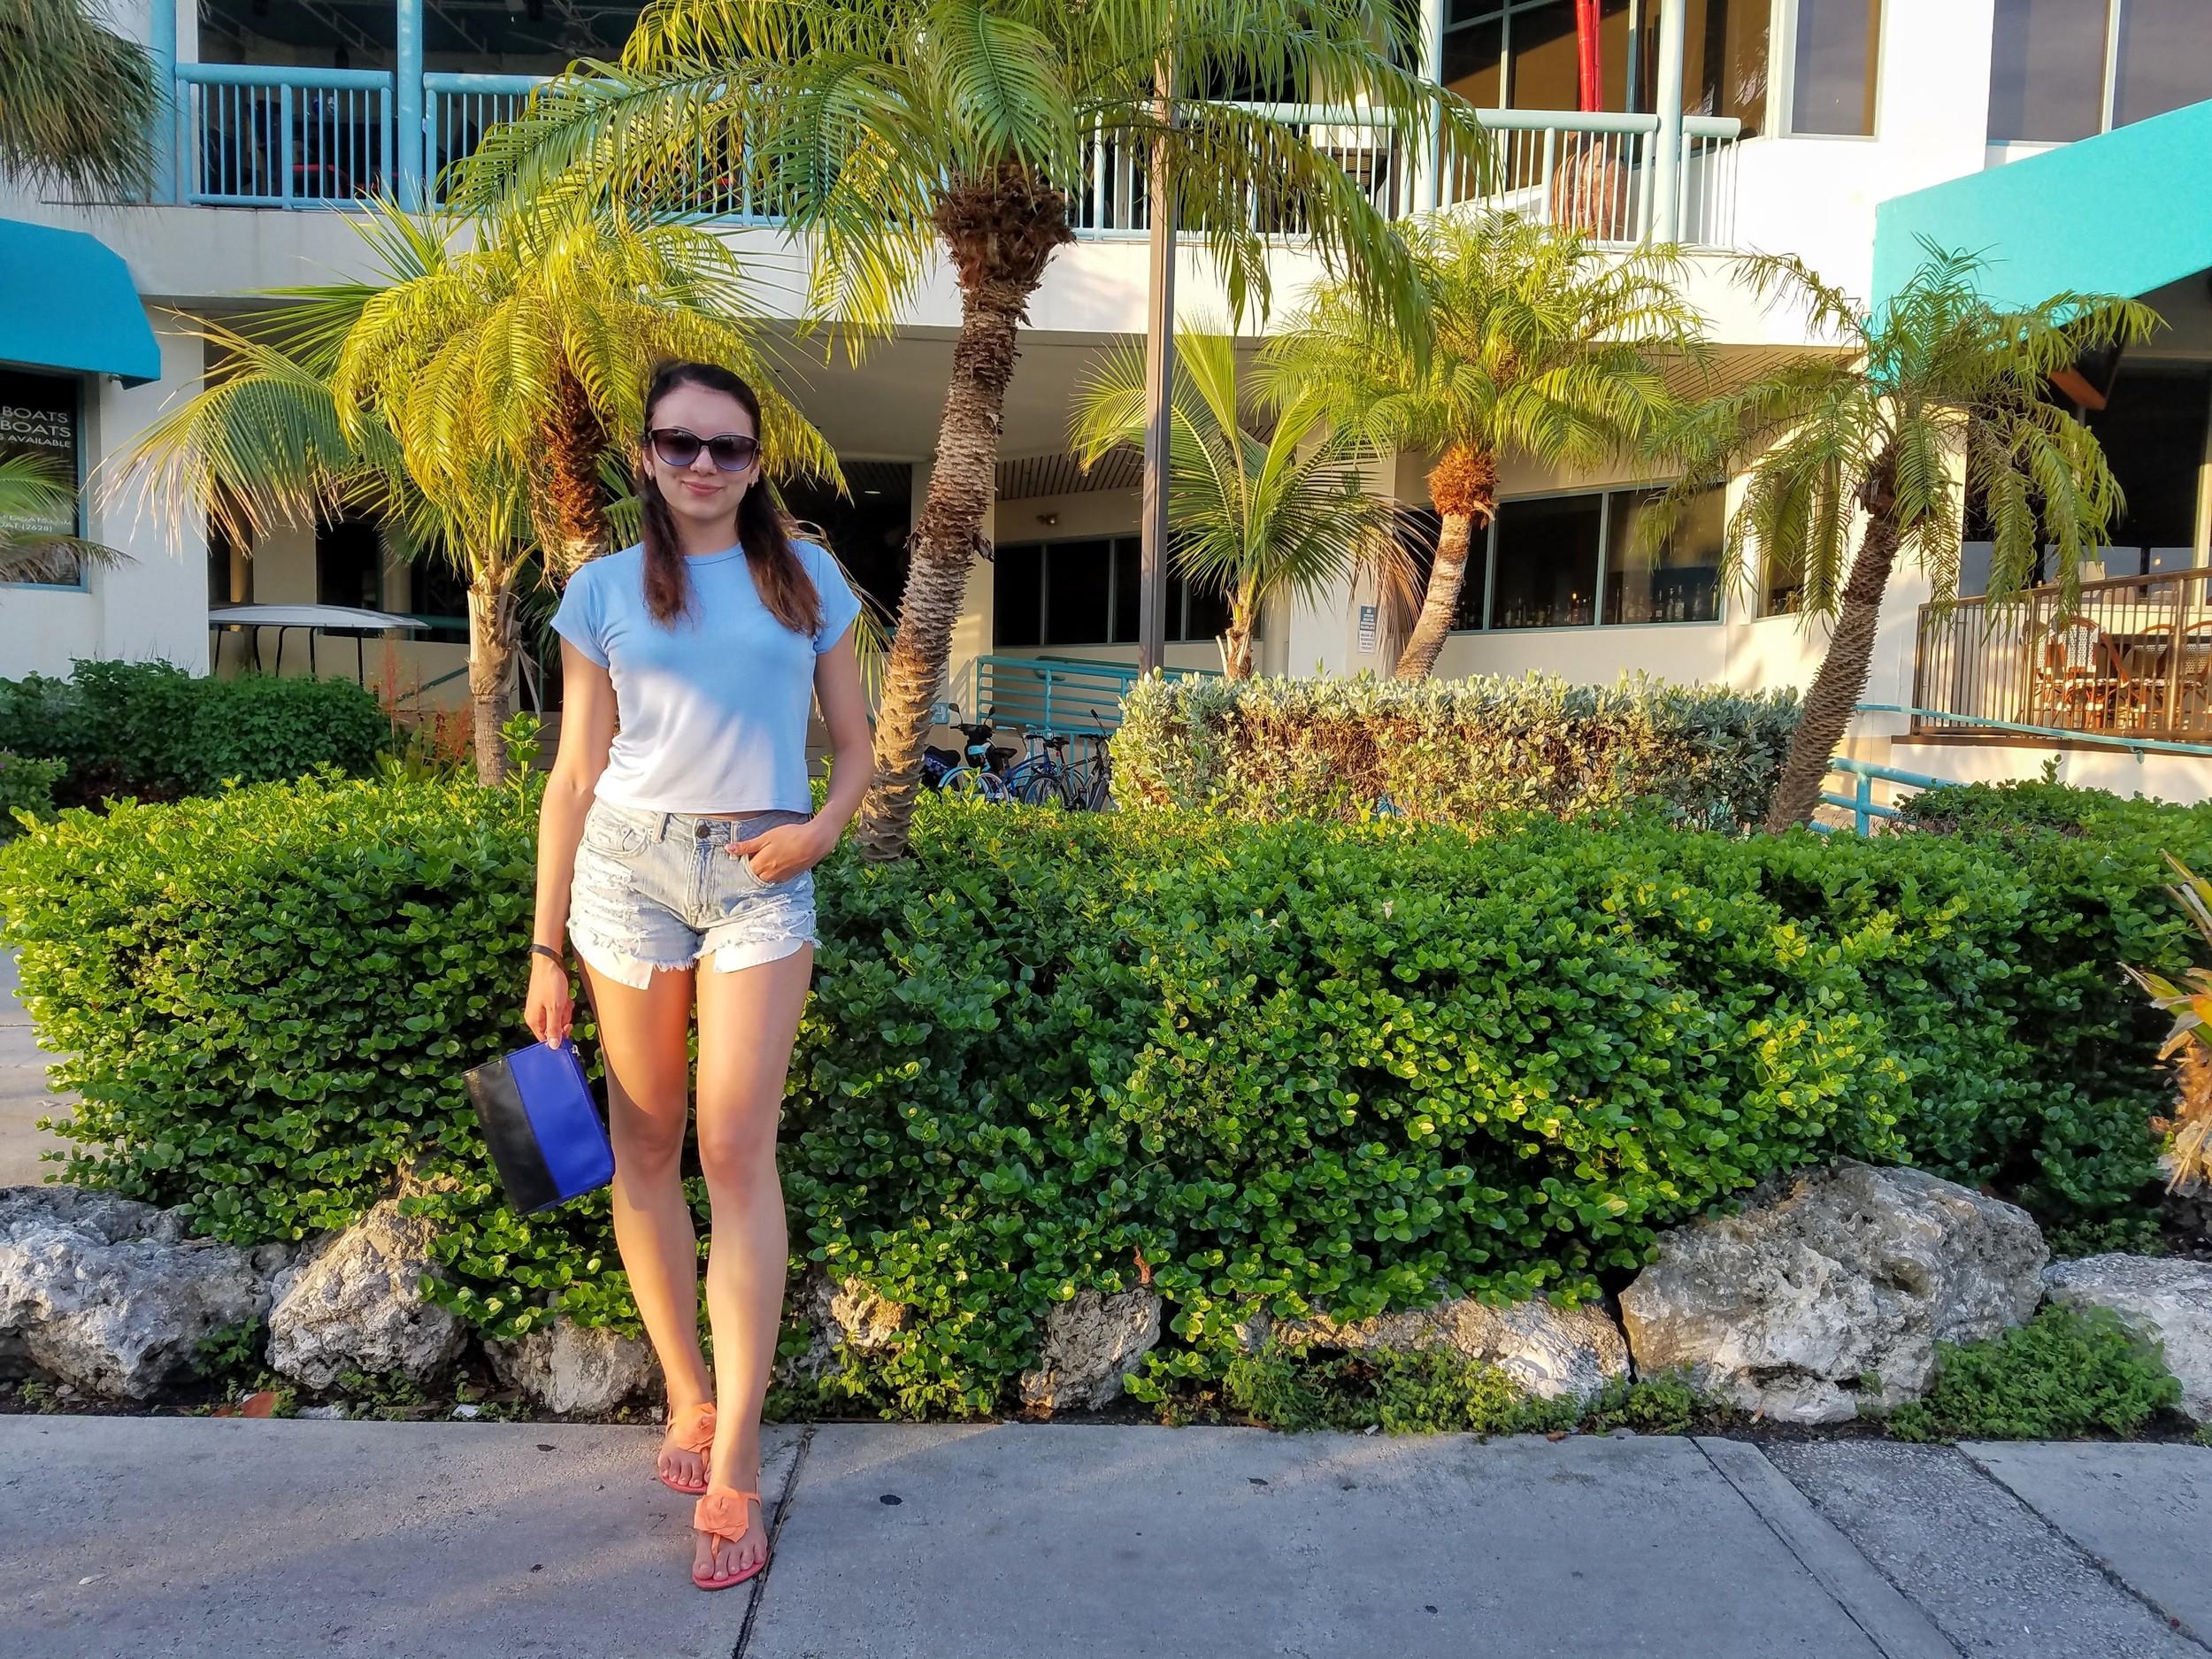 Miami vacation traveler summer lifestyle fashion style ootd palmtrees summer LifeOfArdor